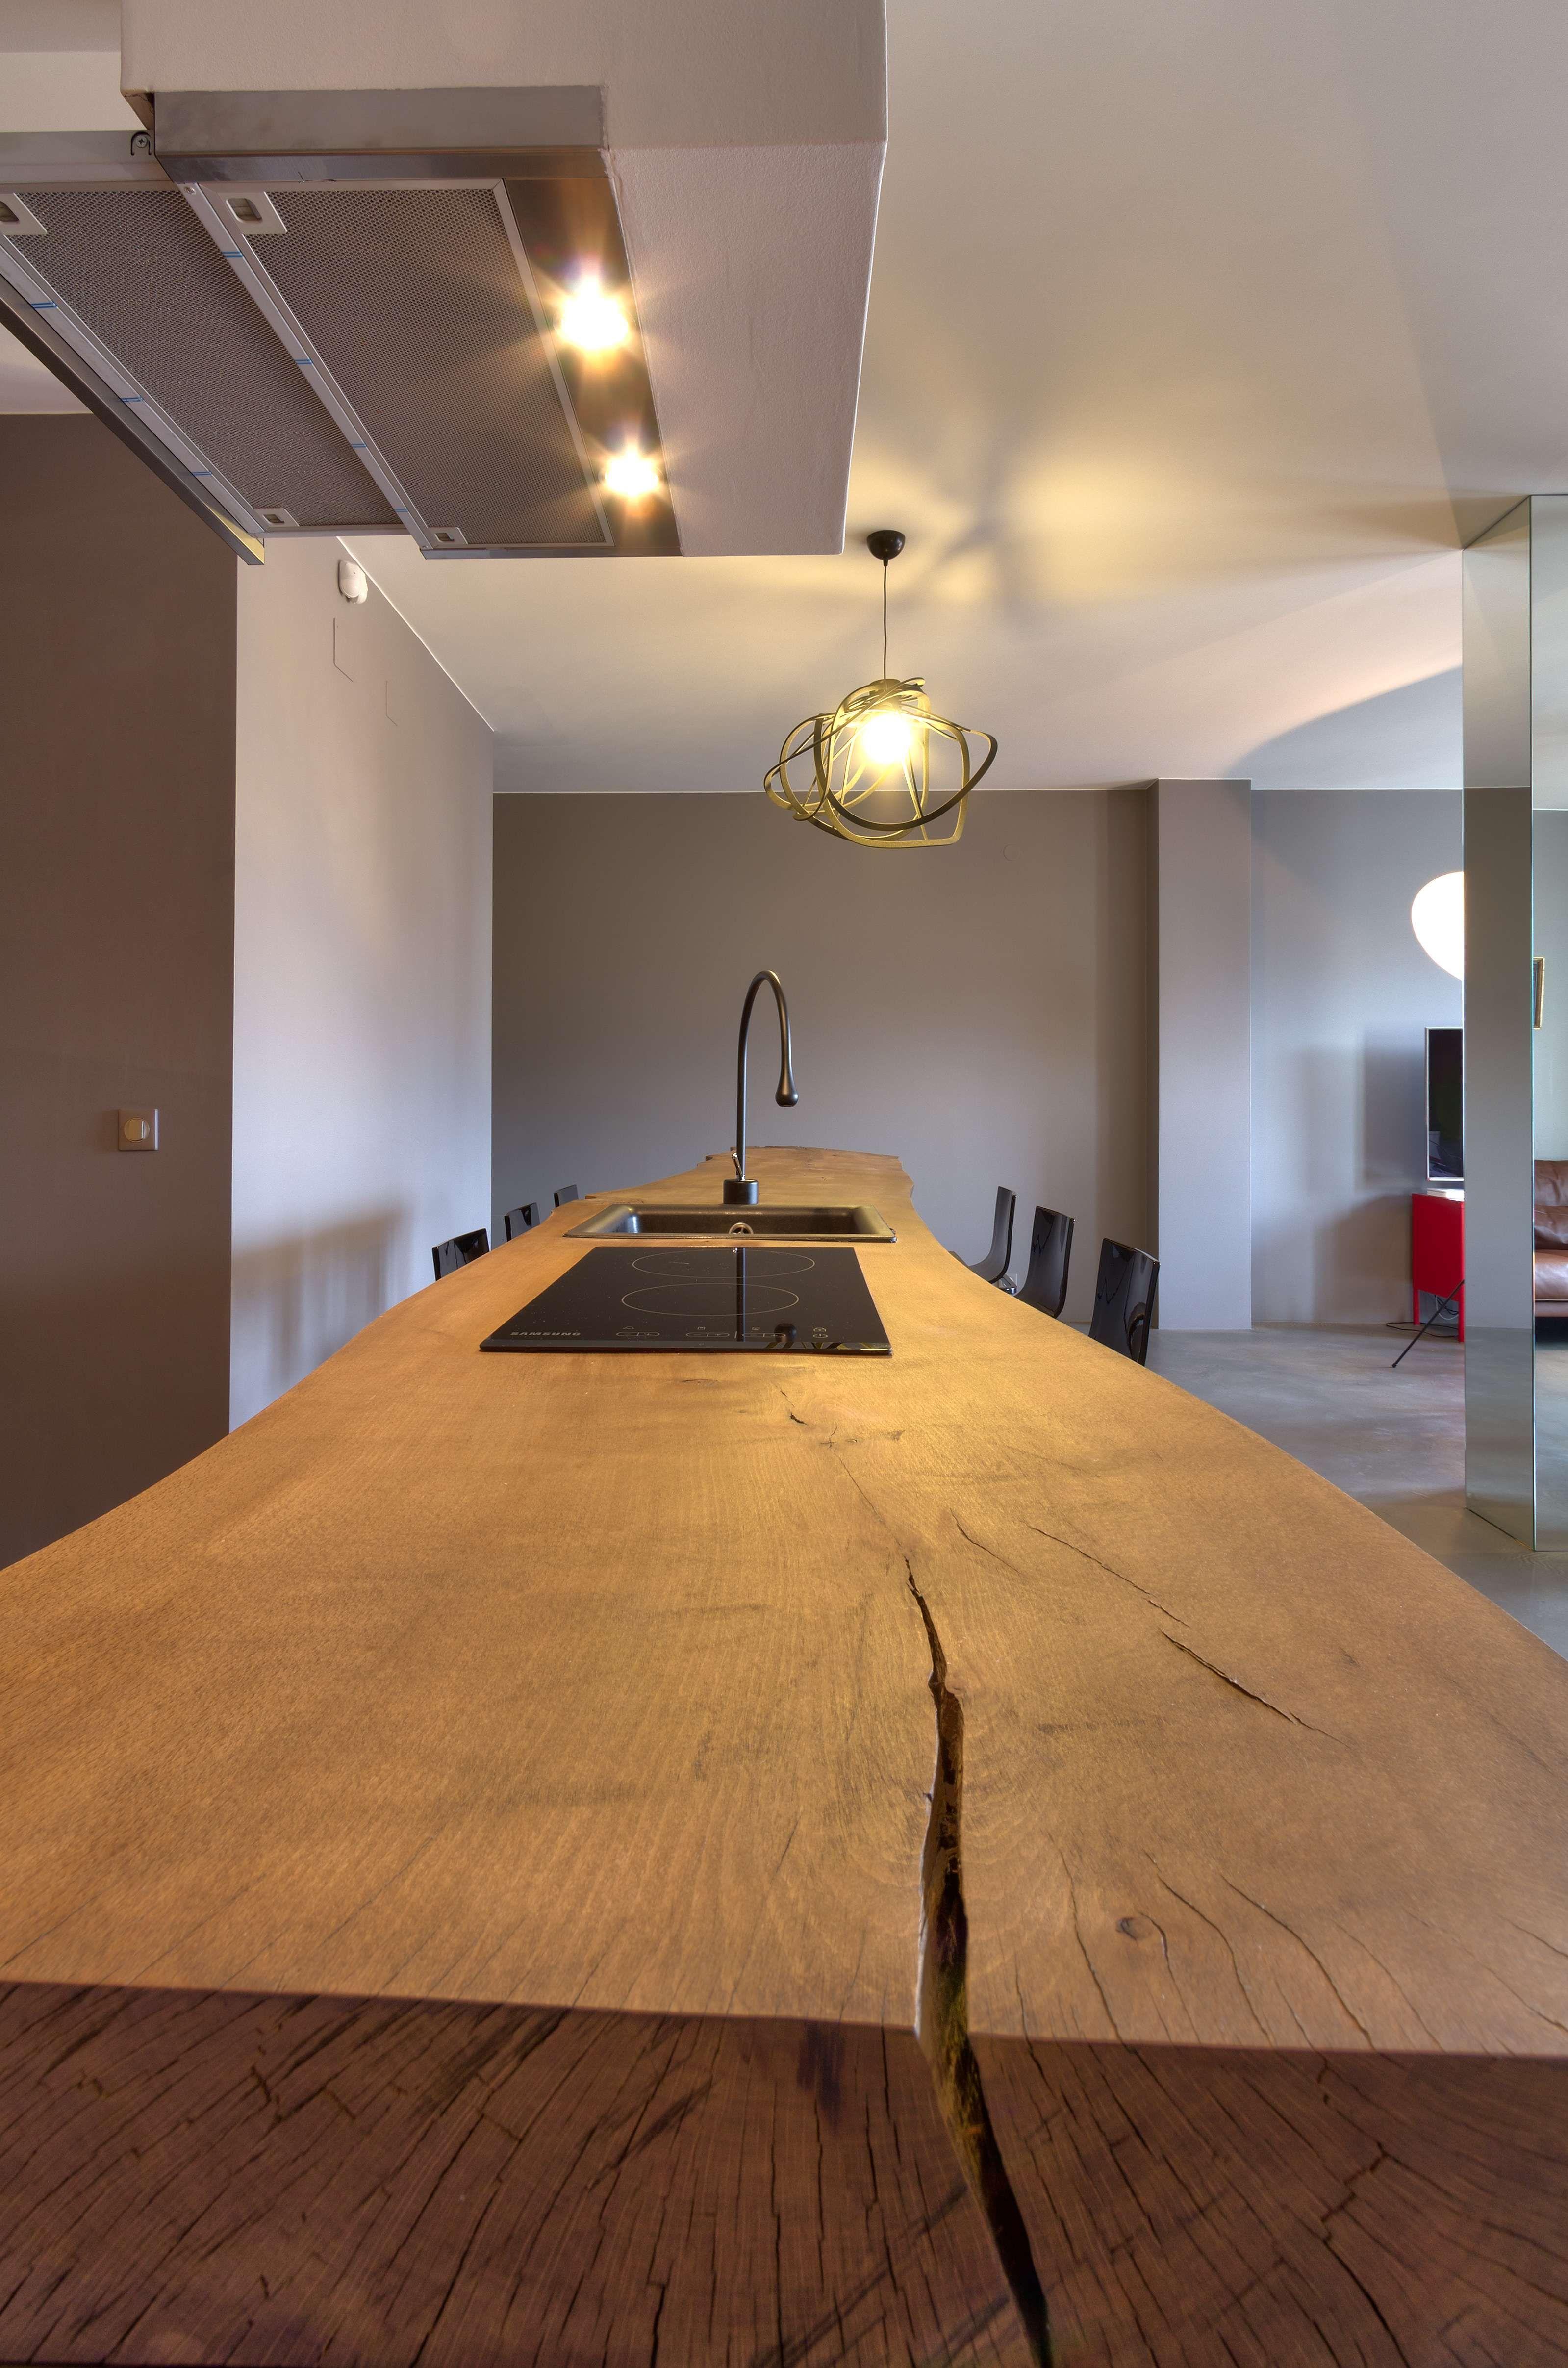 Kitchen apartment in sofia bulgaria by designmi studio interior